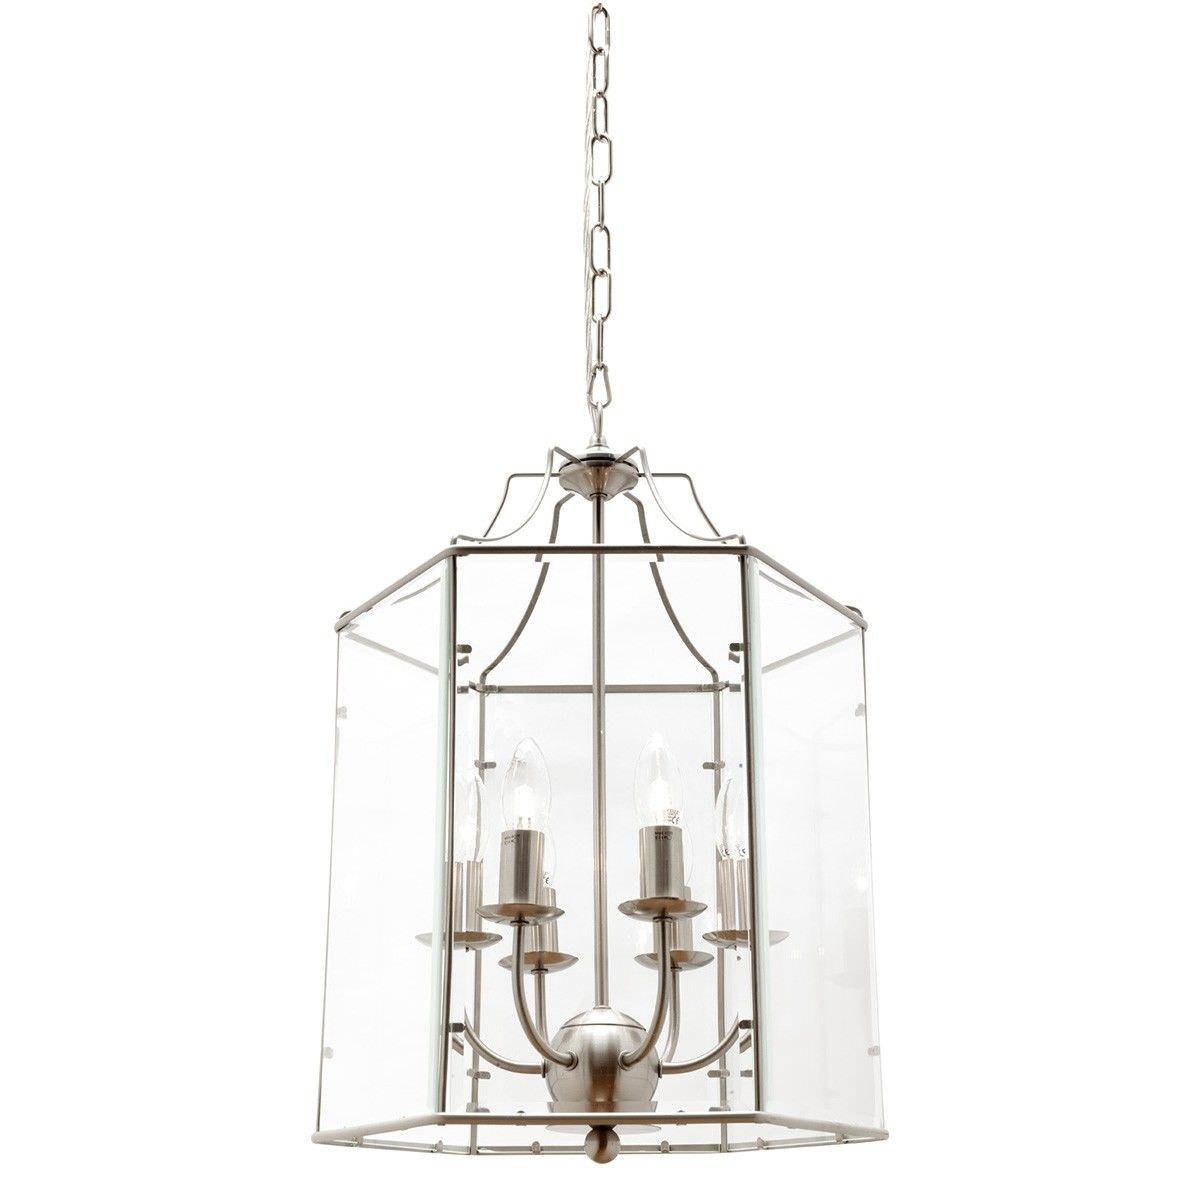 Arcadia Metal & Glass Pendant Light, Large, Chrome